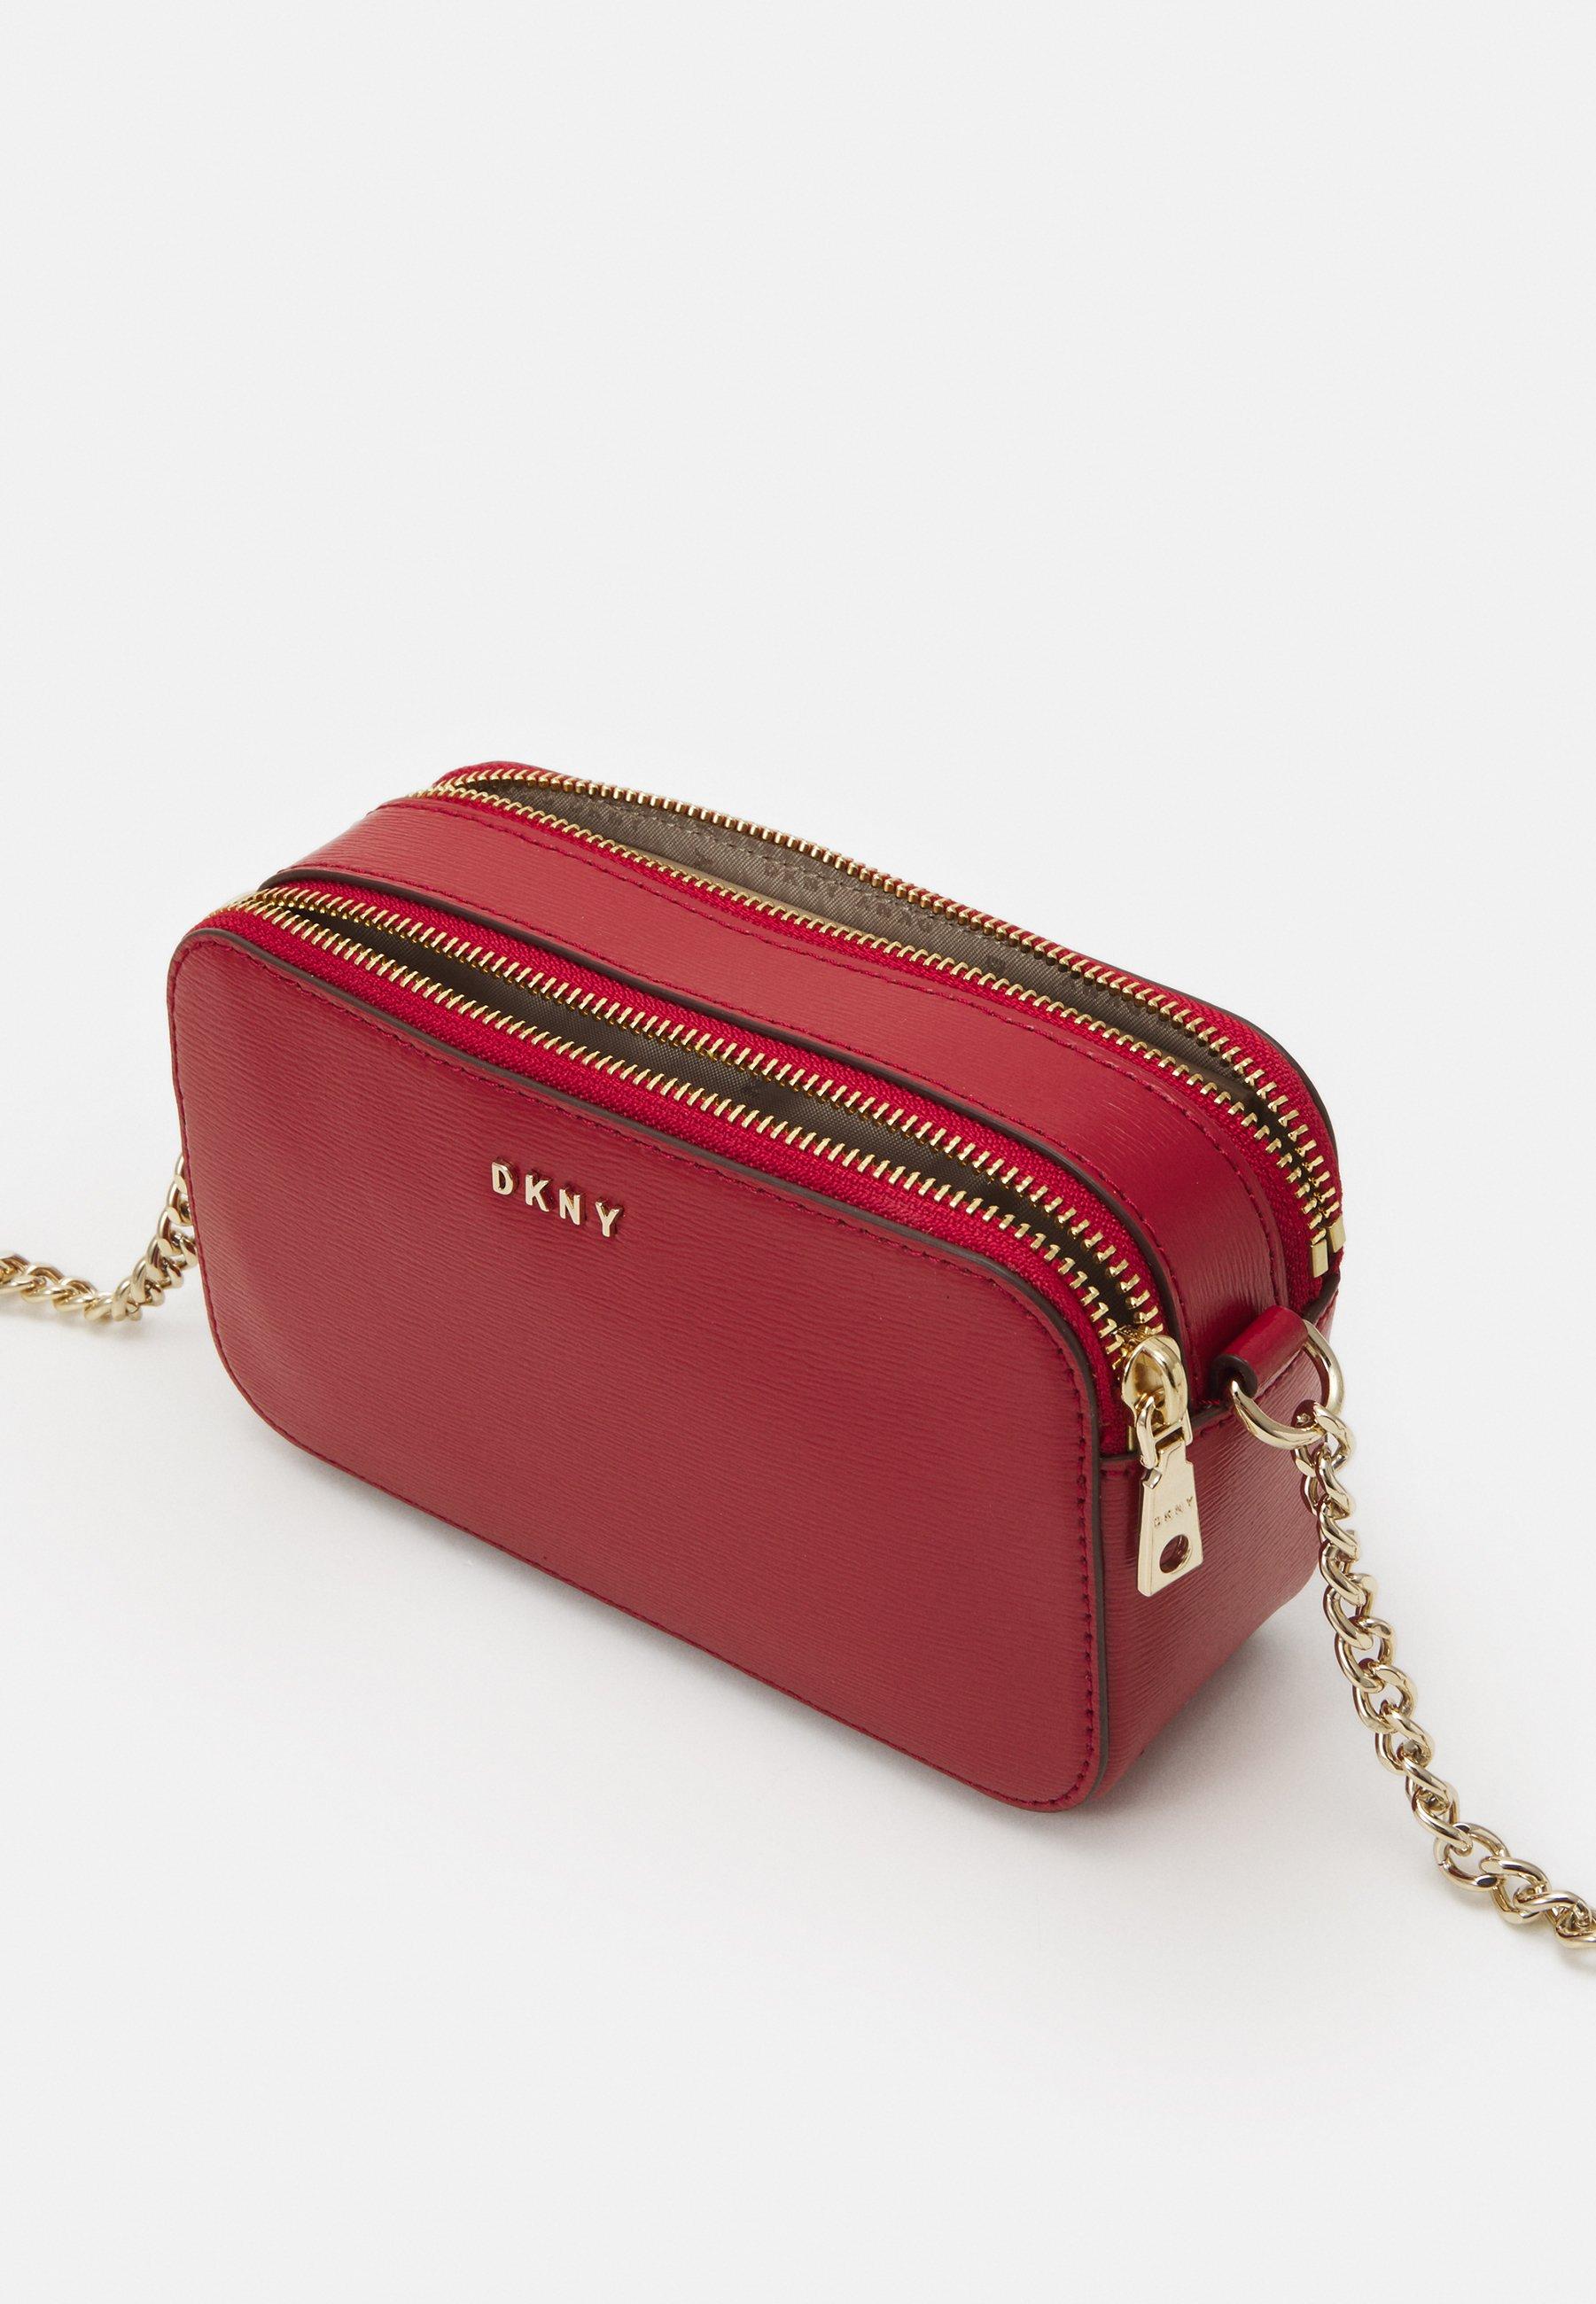 DKNY BRYANT CAMERA BAG SUTTON - Skulderveske - bright red/rød 9htmBtzJxlISfWW